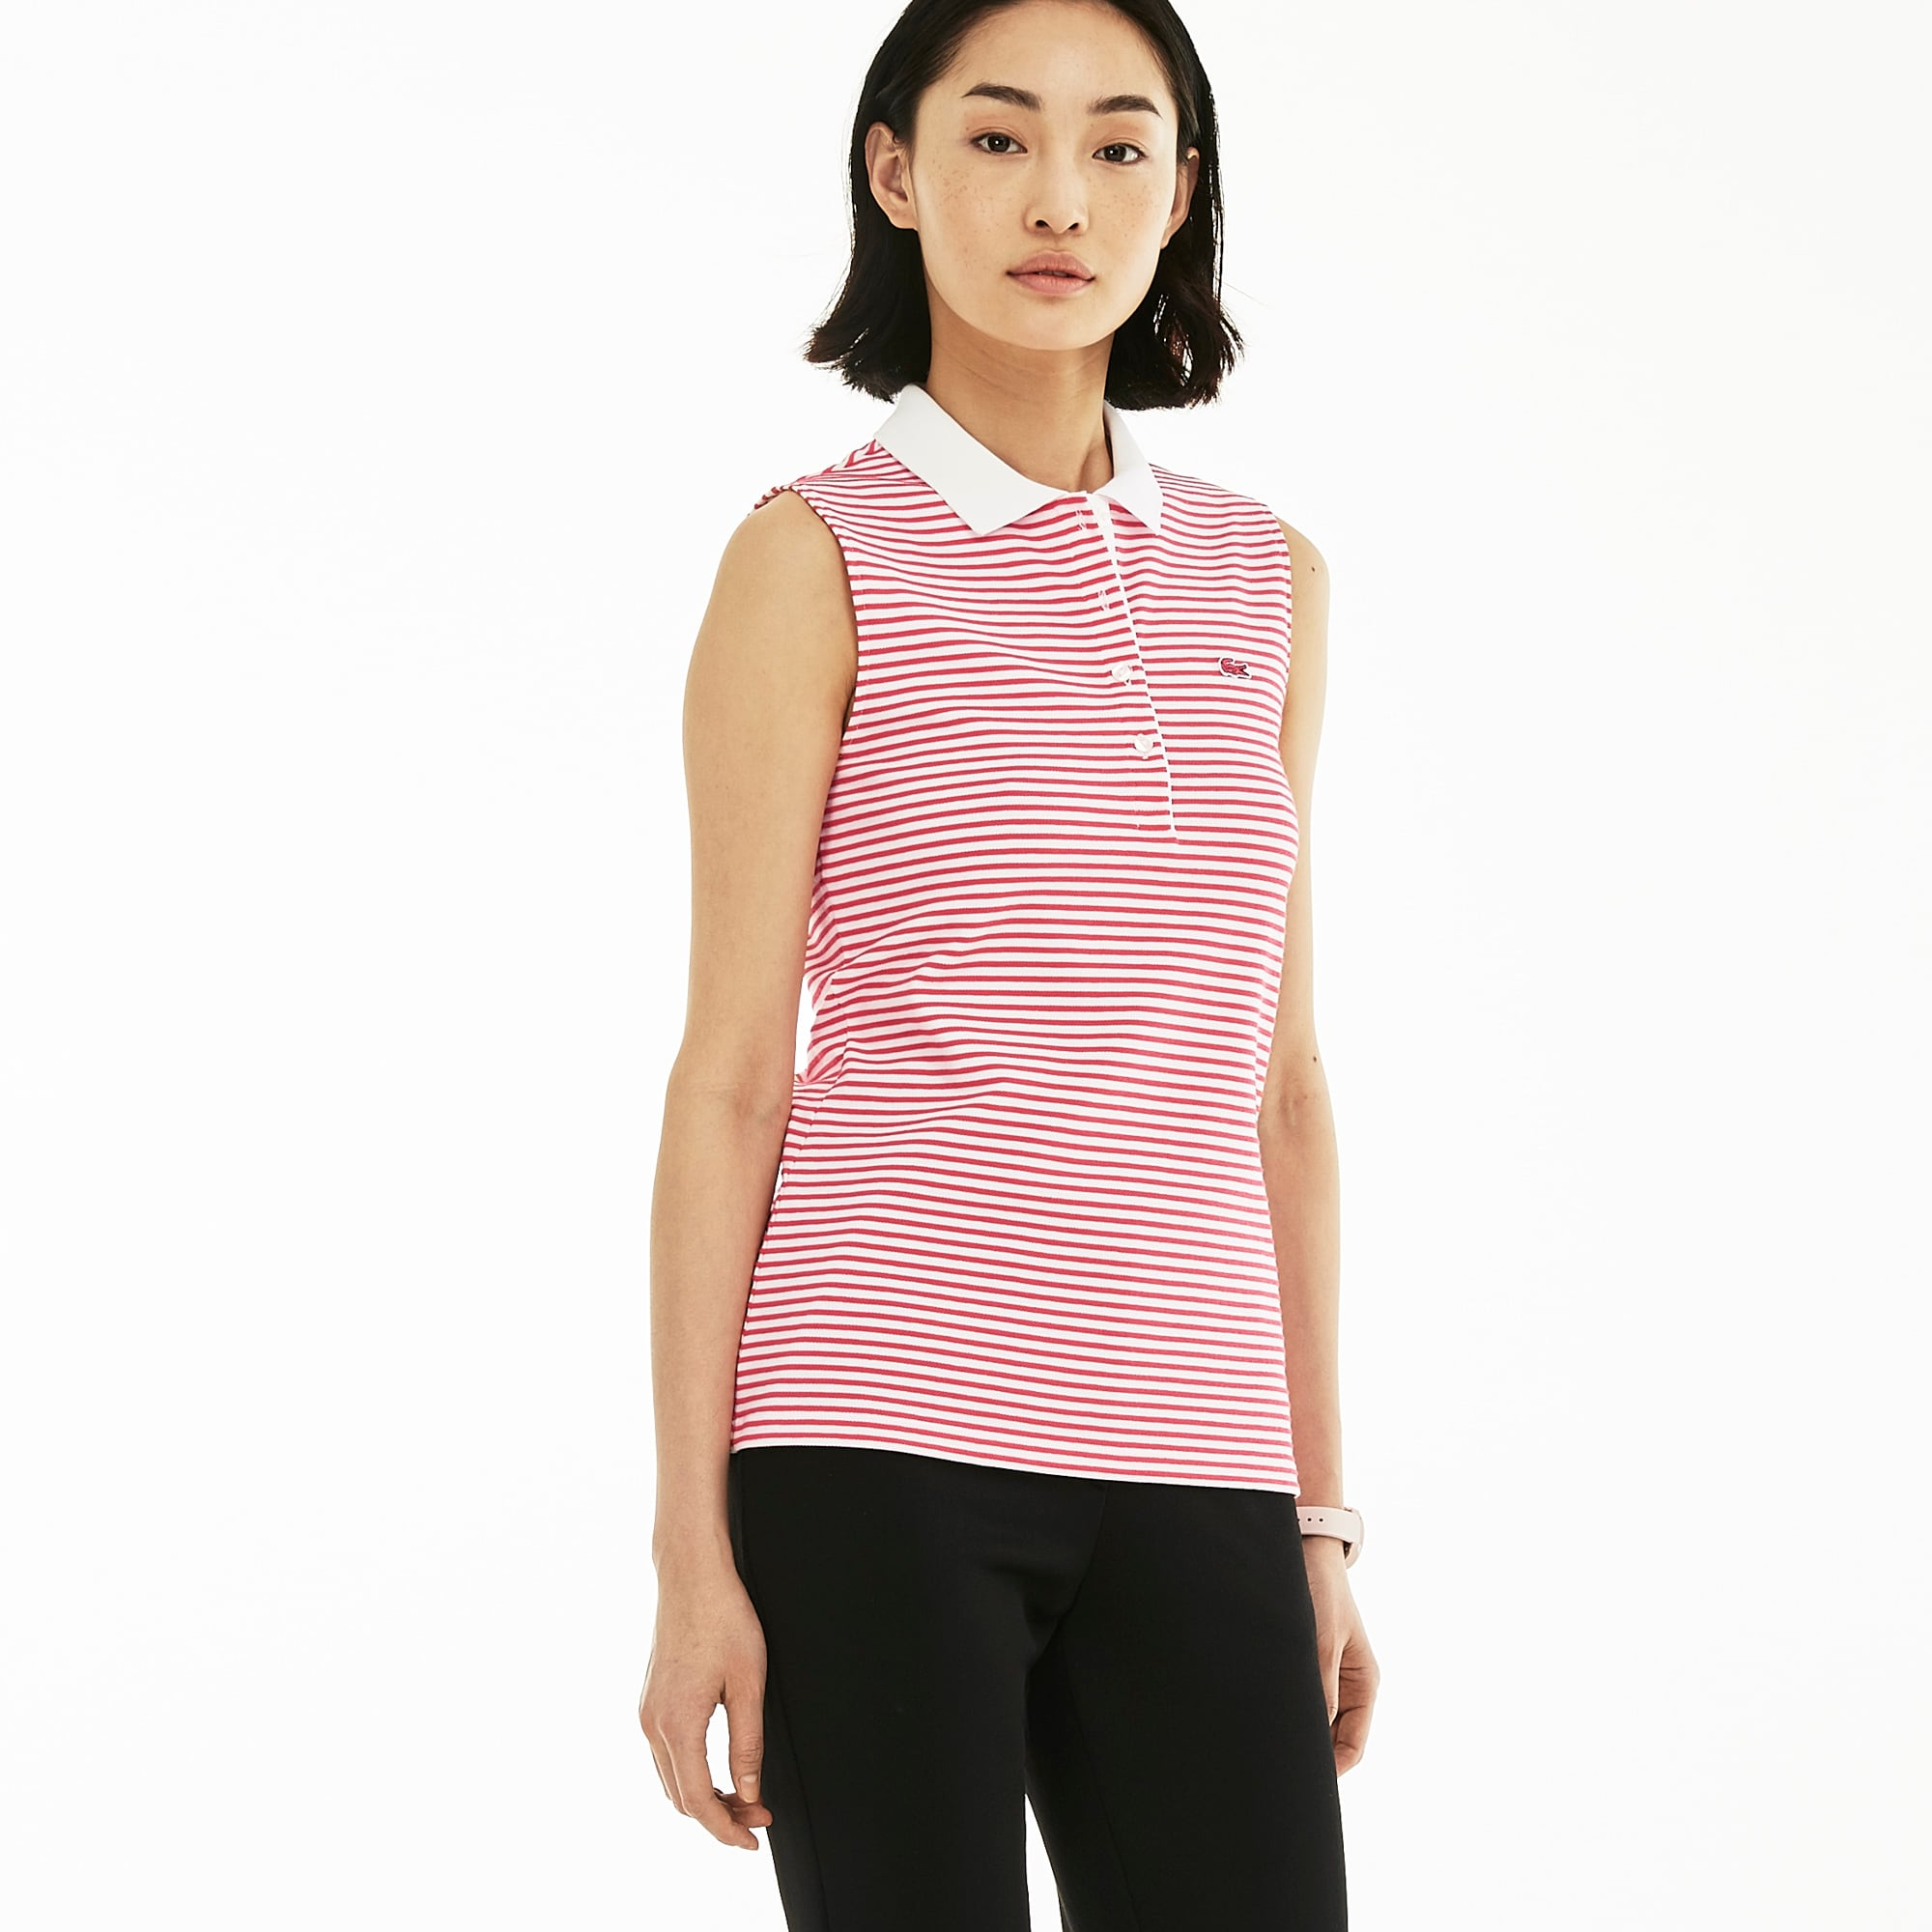 Women's Slim Fit Stretch Striped Petit Piqué Polo Shirt